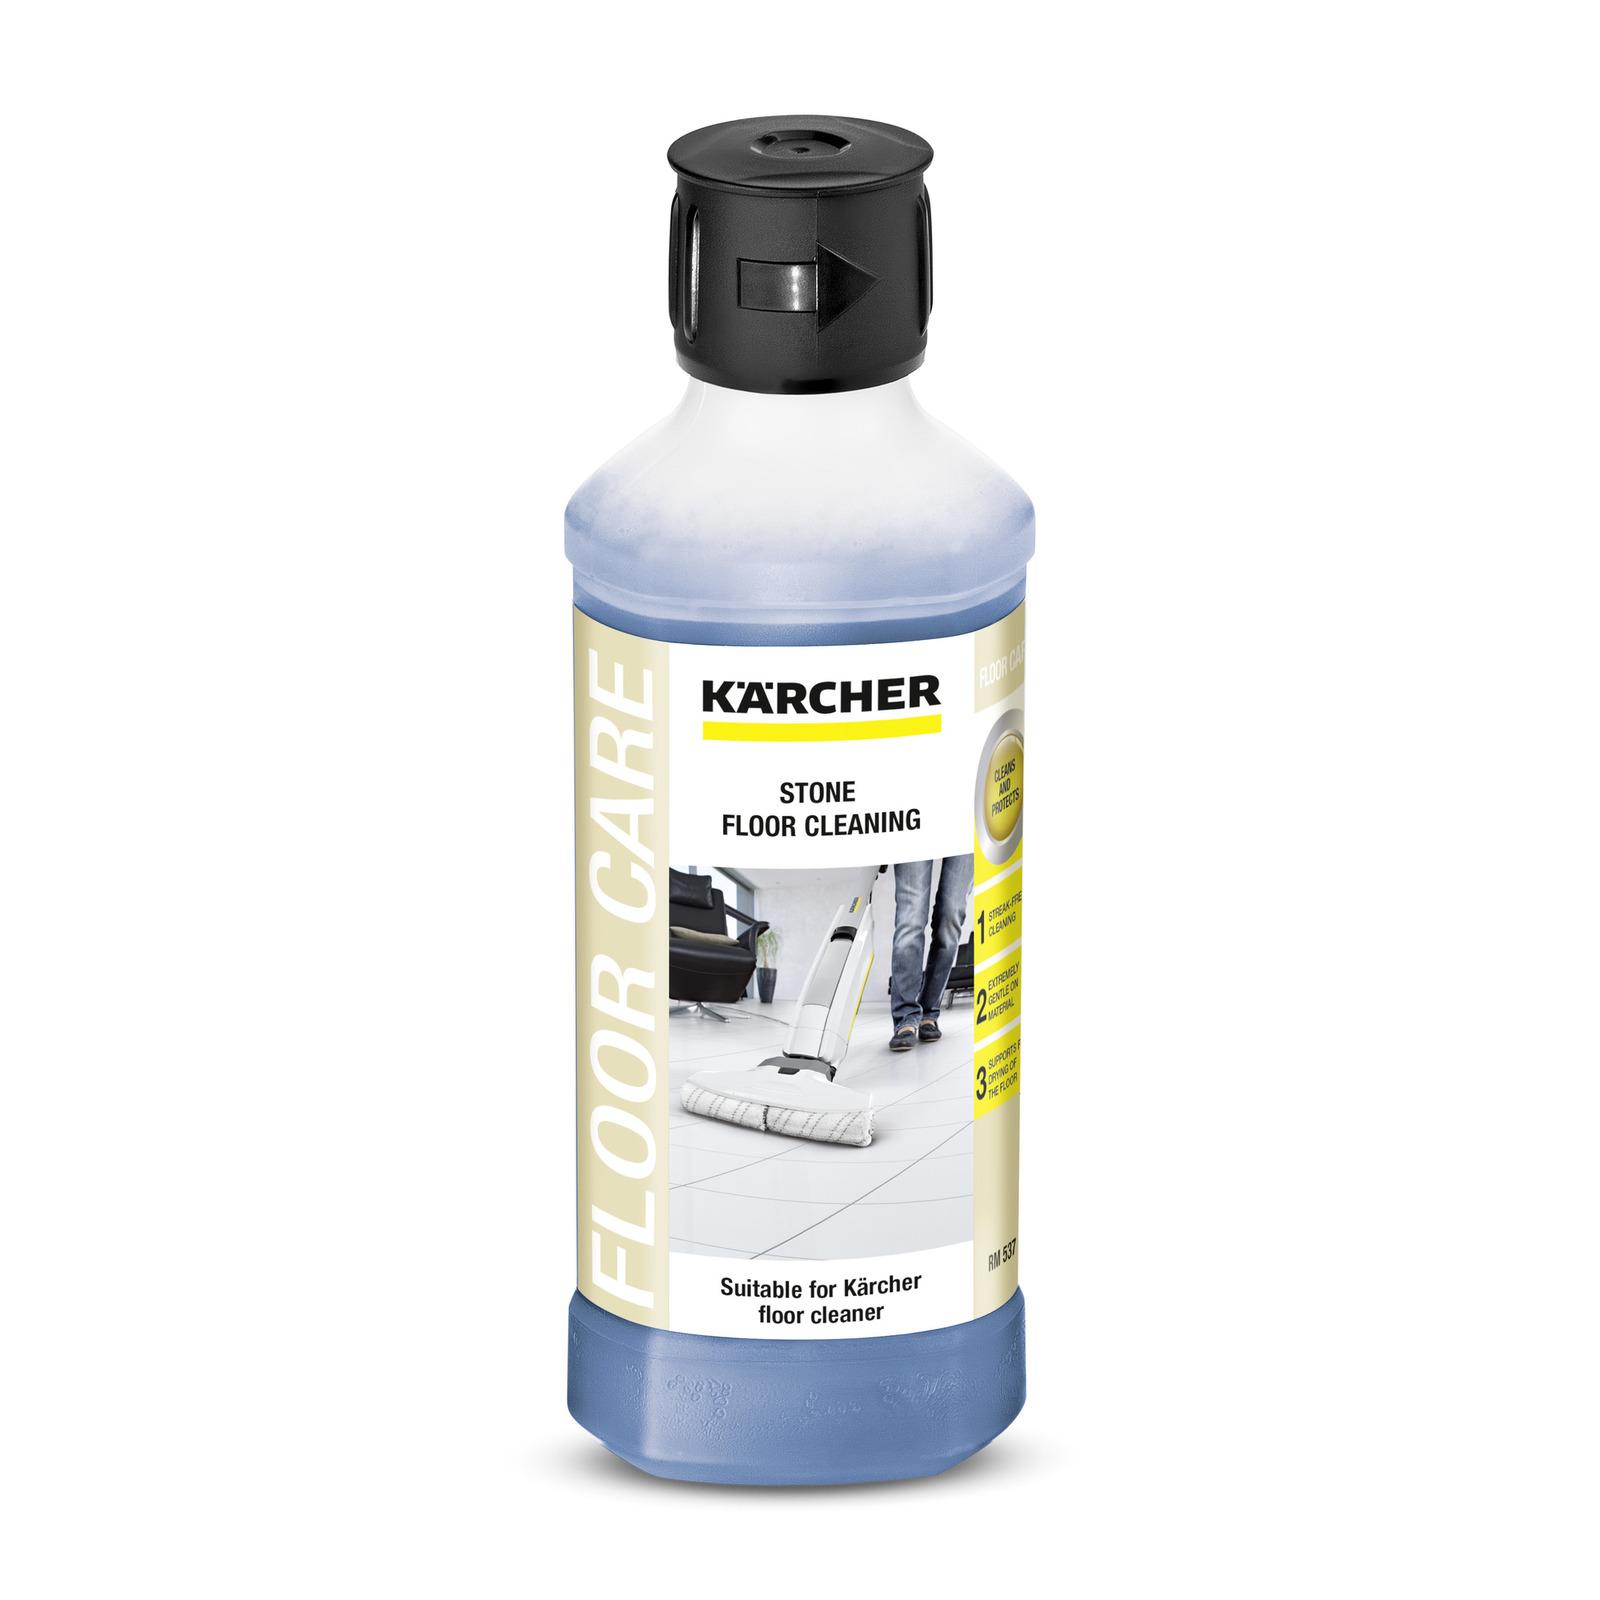 Kärcher - Stone Floor Cleaner (500ml)